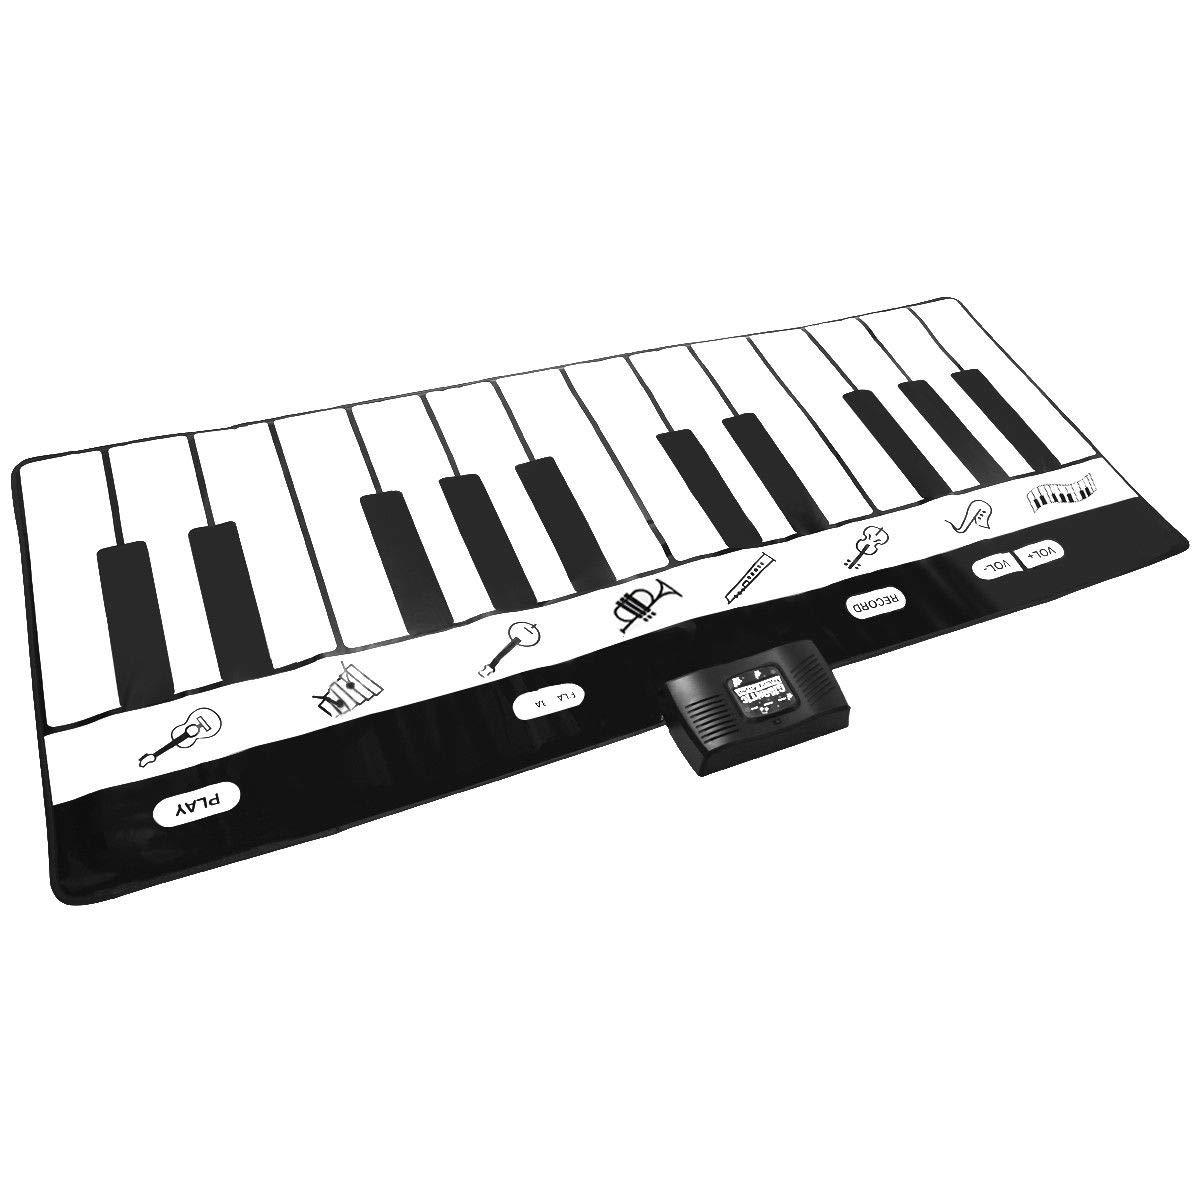 FDInspiration 71'' Kids 24-Key Keyboard Dance Gigantic Piano Playmat w/ 4 Modes with Ebook by FDInspiration (Image #9)